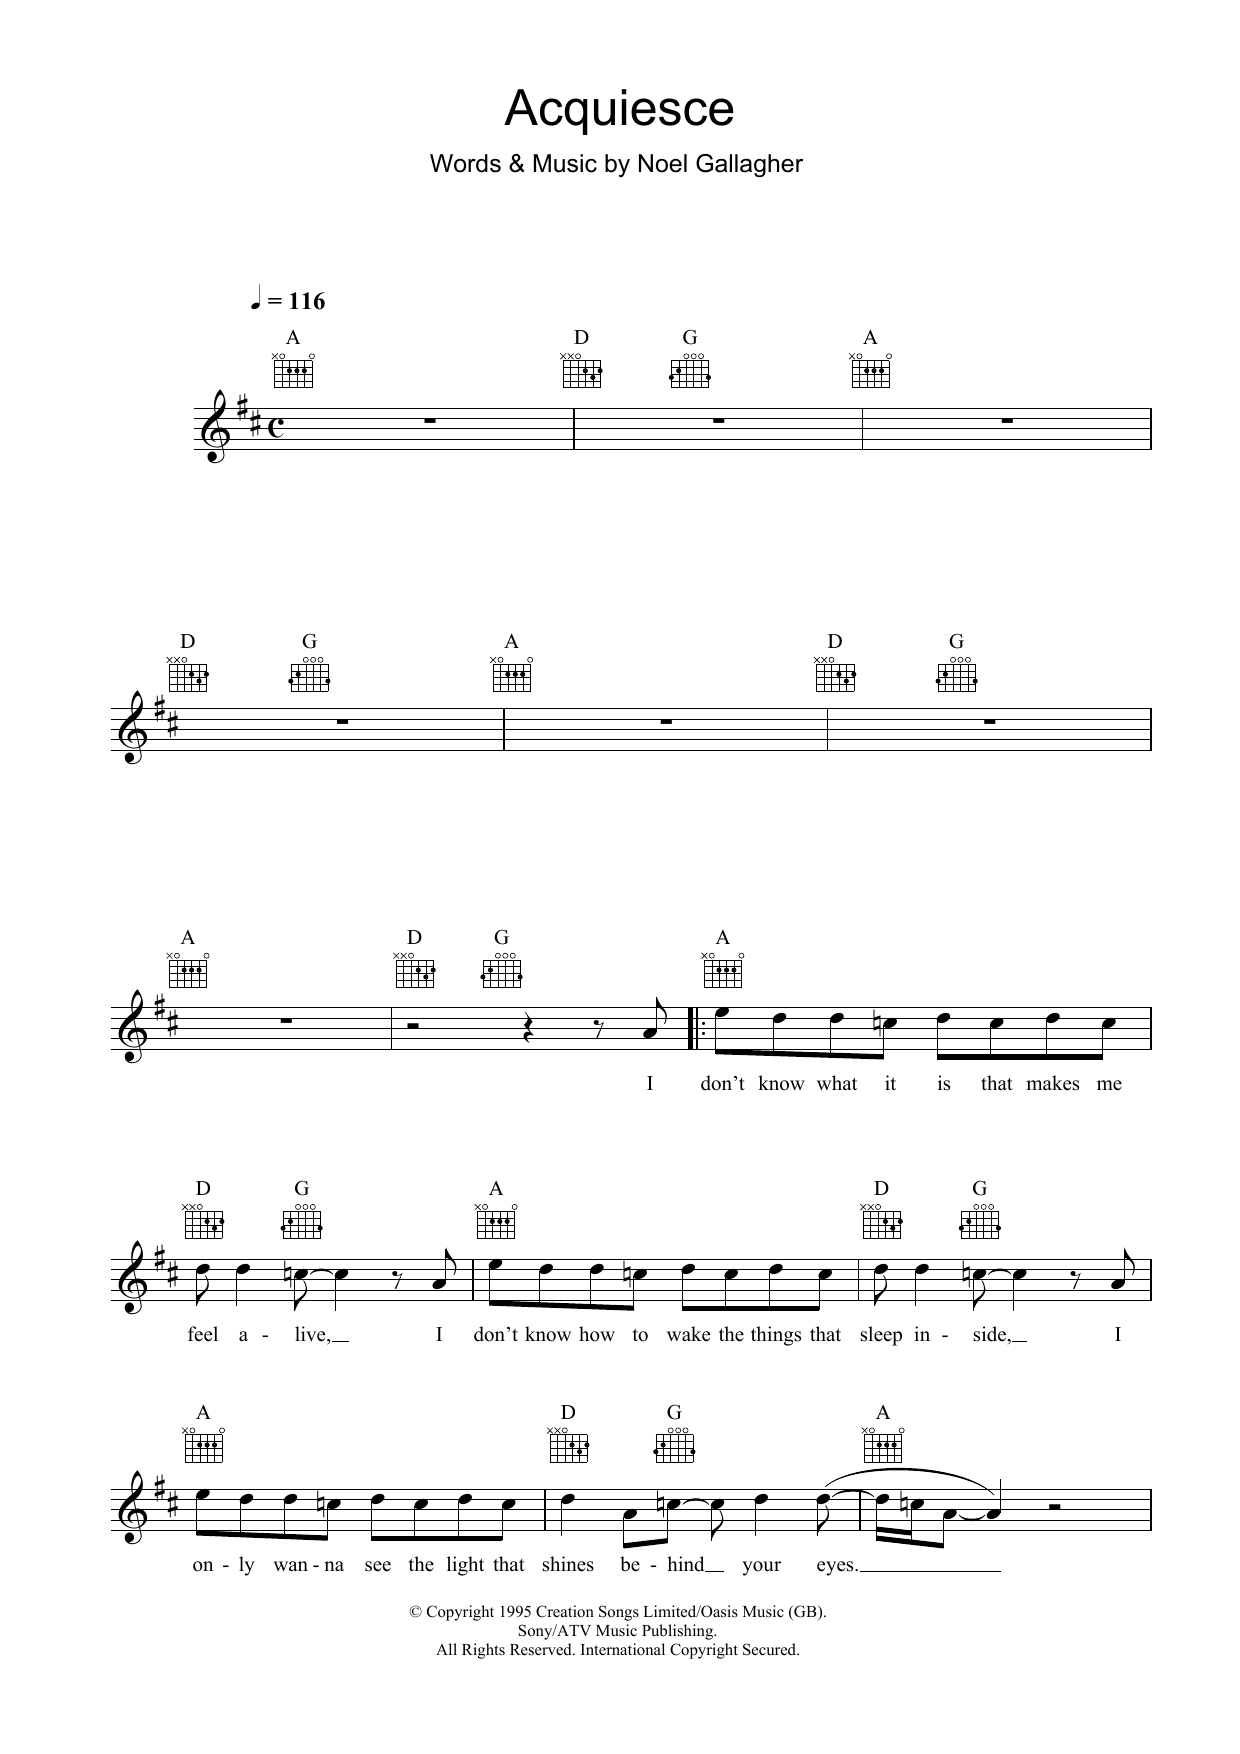 Acquiesce Sheet Music